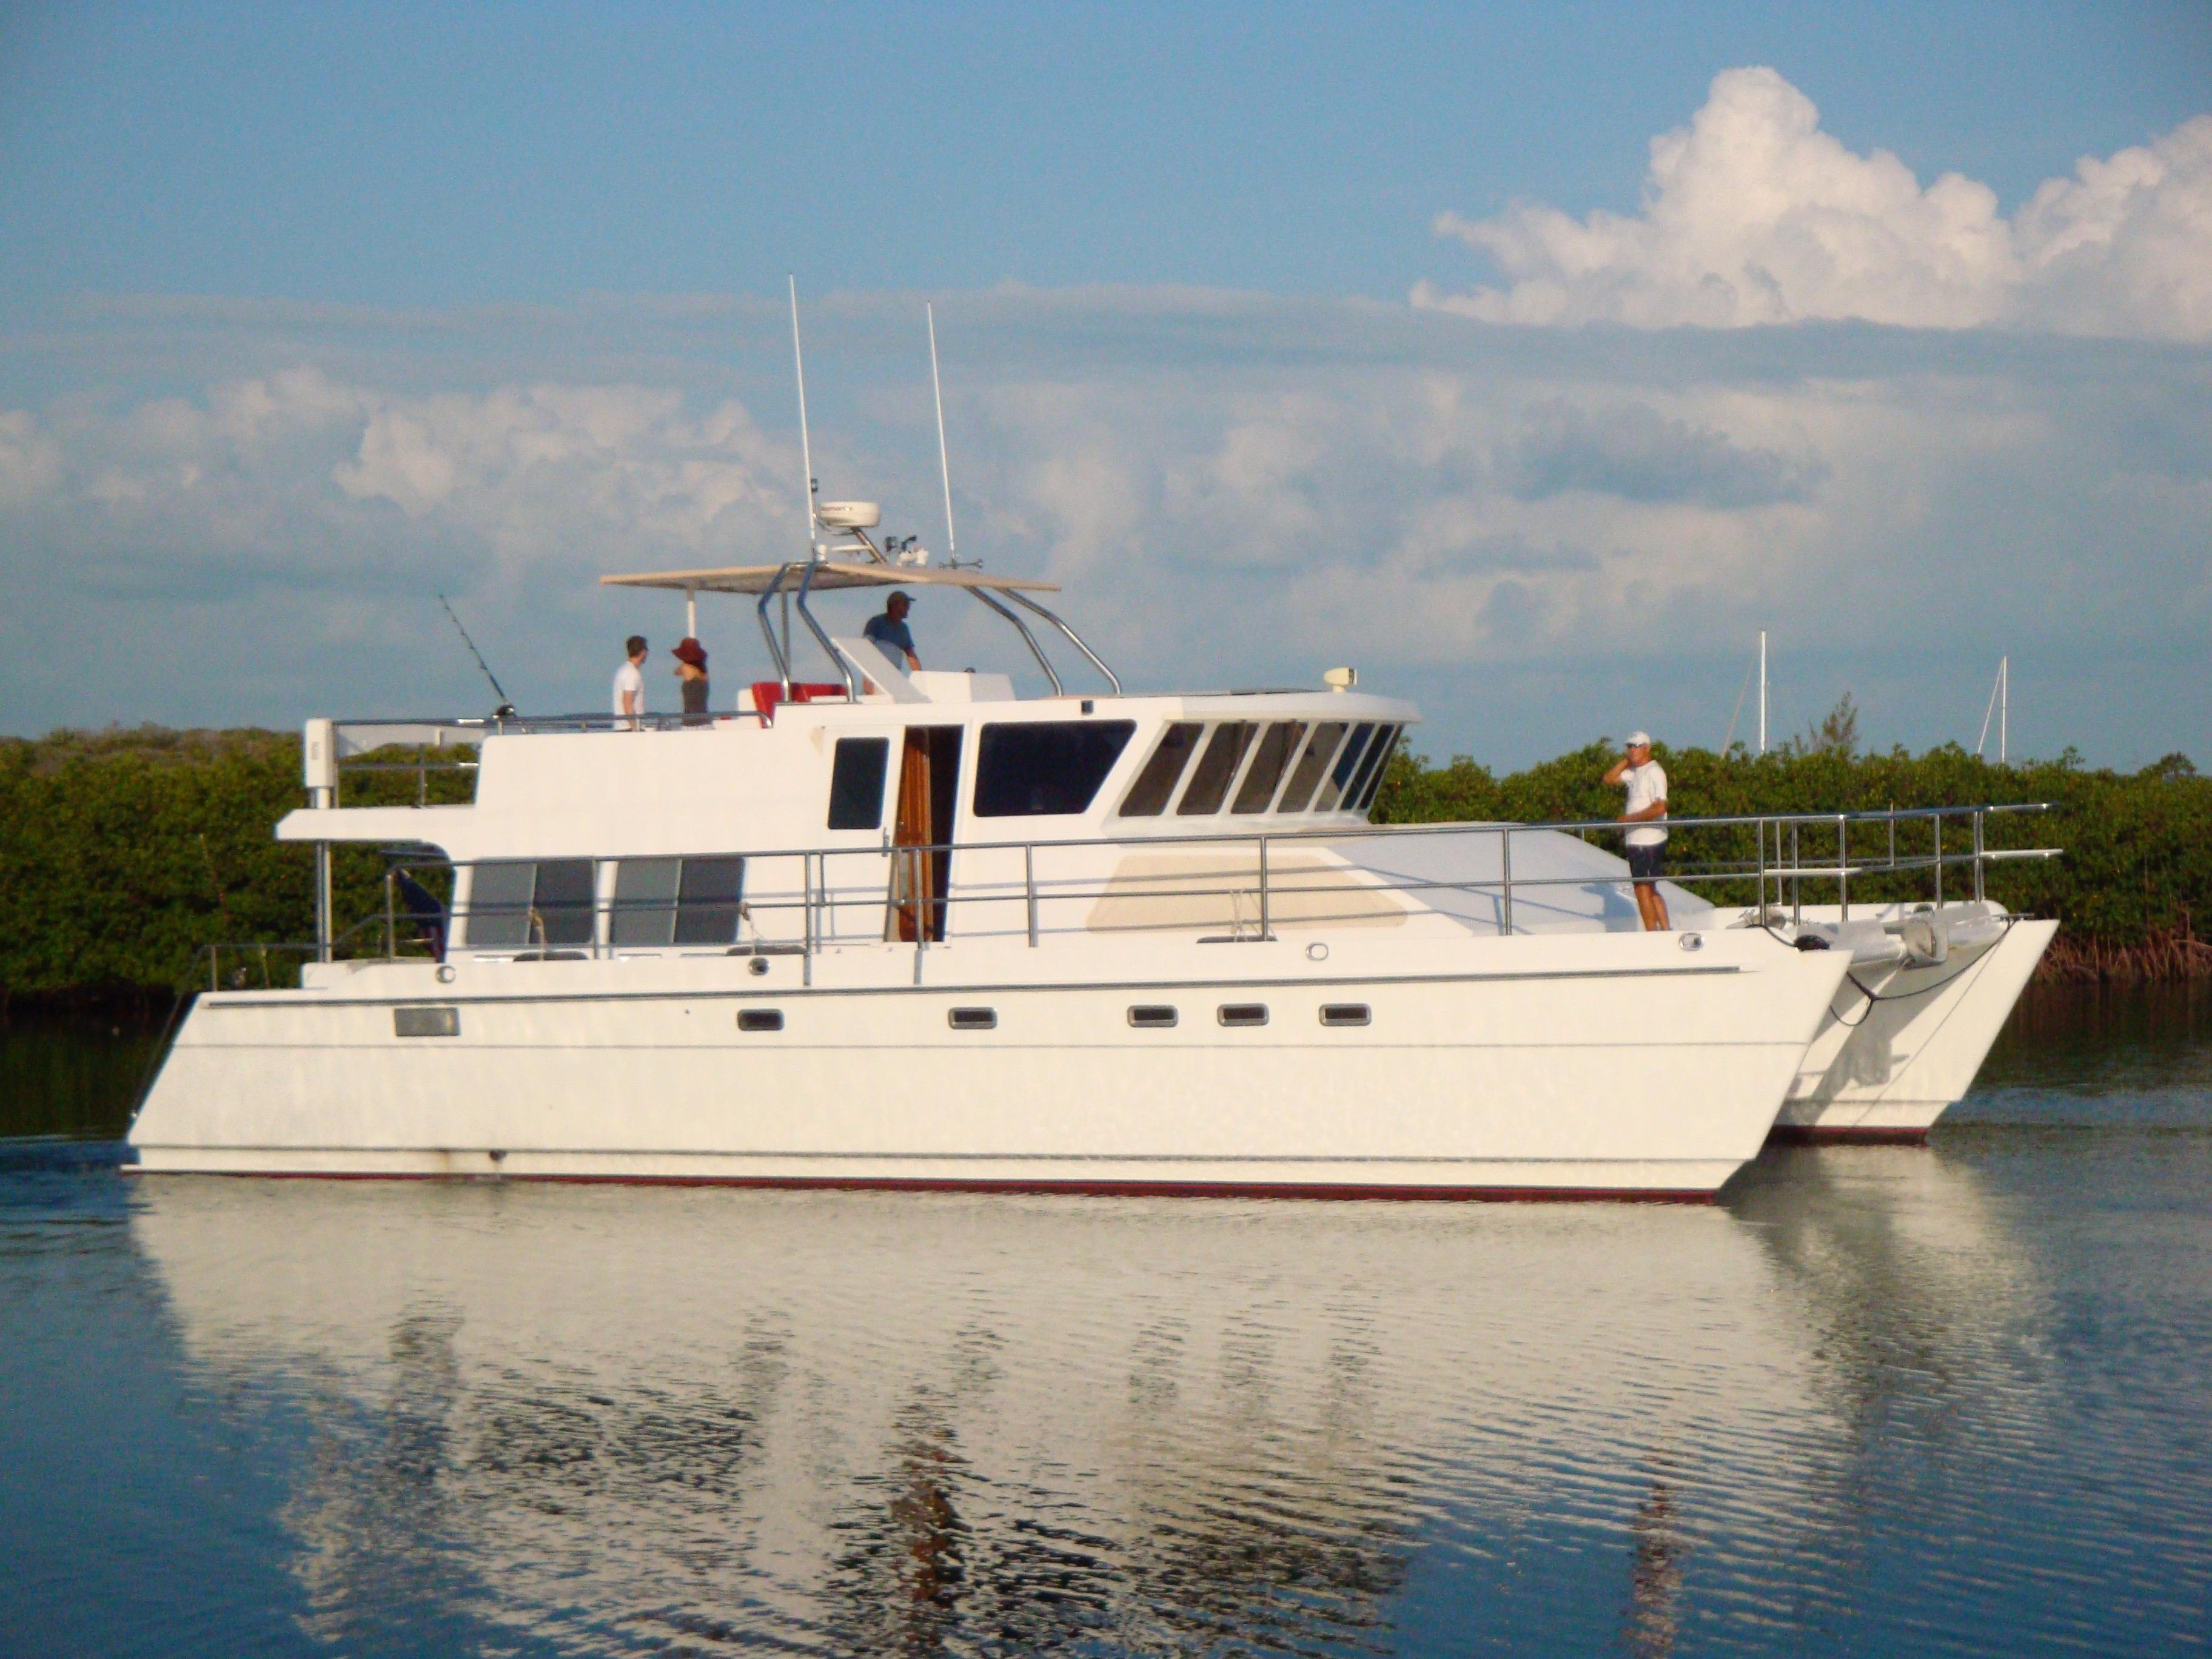 2006 Malcolm Tennant Power Catamaran Power Boat For Sale